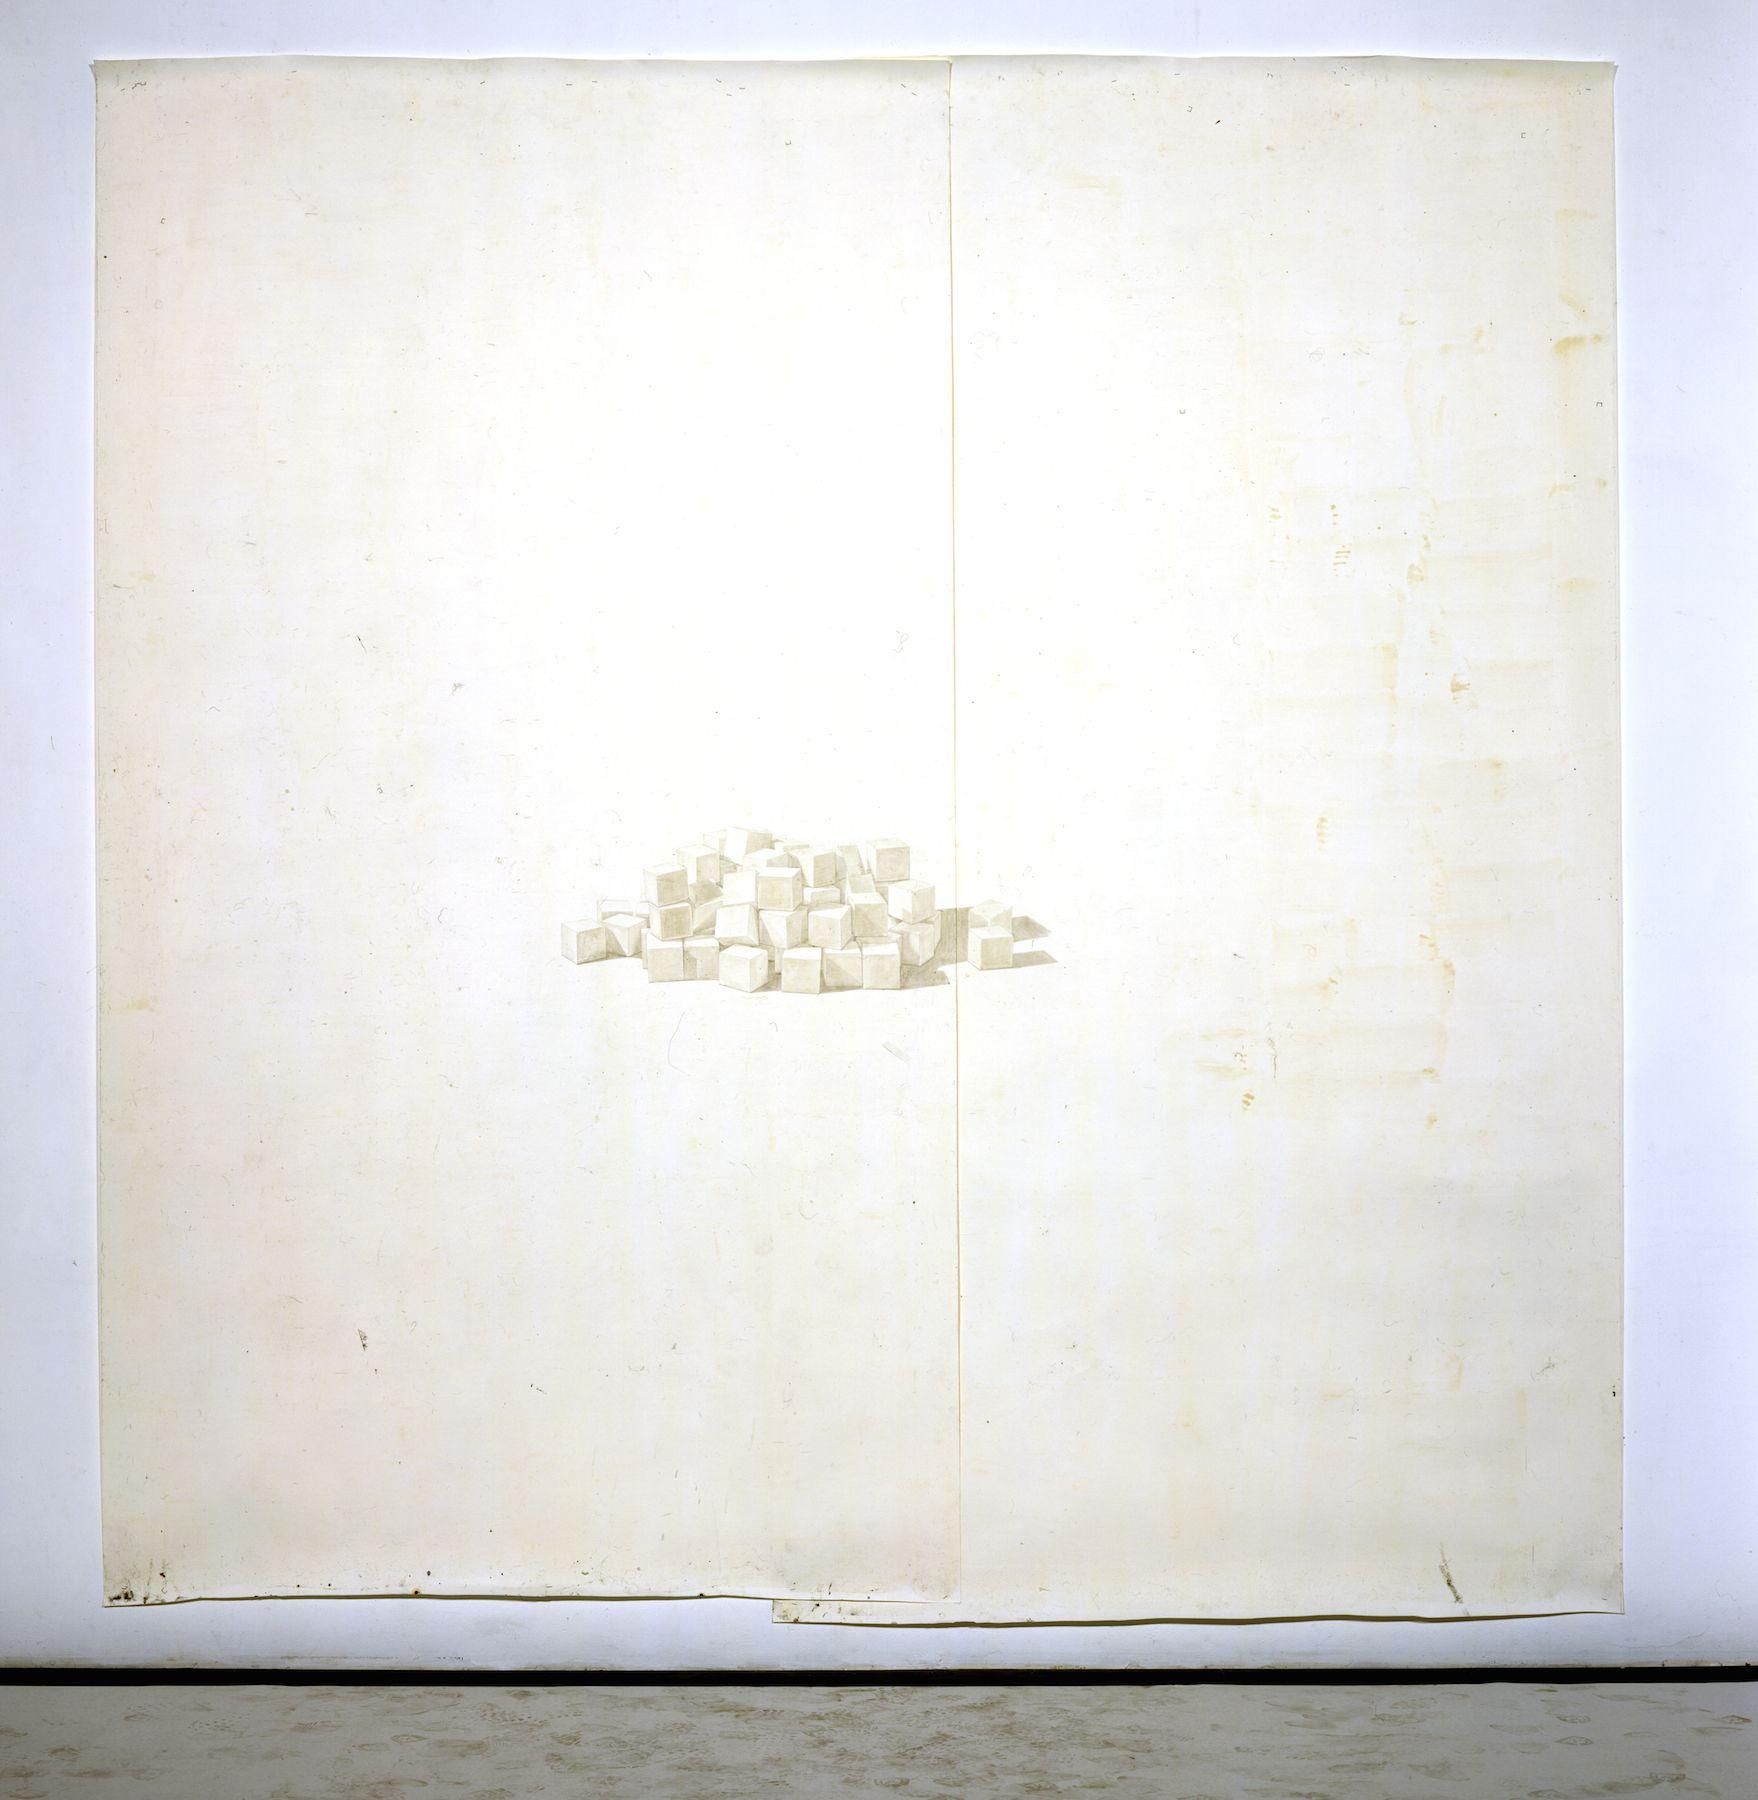 Toba Khedoori, Untitled (Blocks)